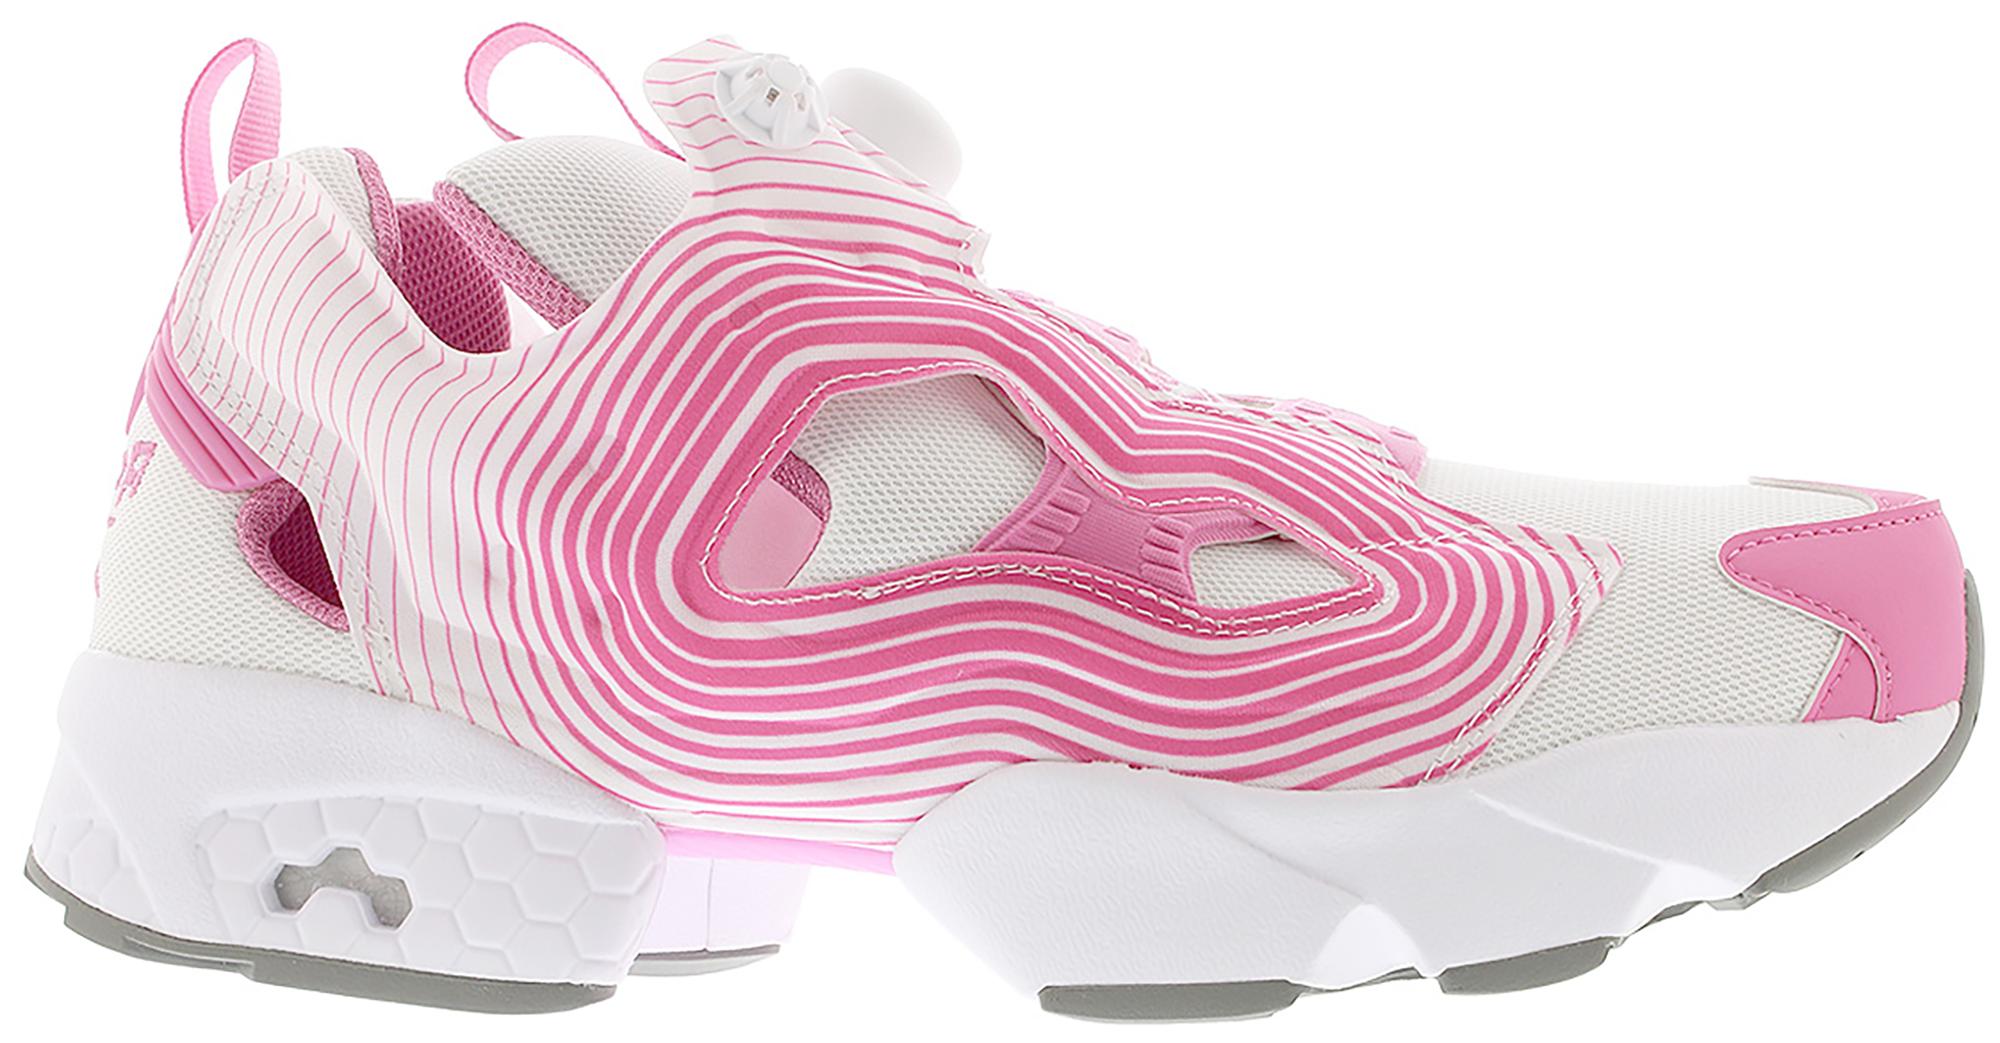 Buy \u003e reebok pump fury pink Limit